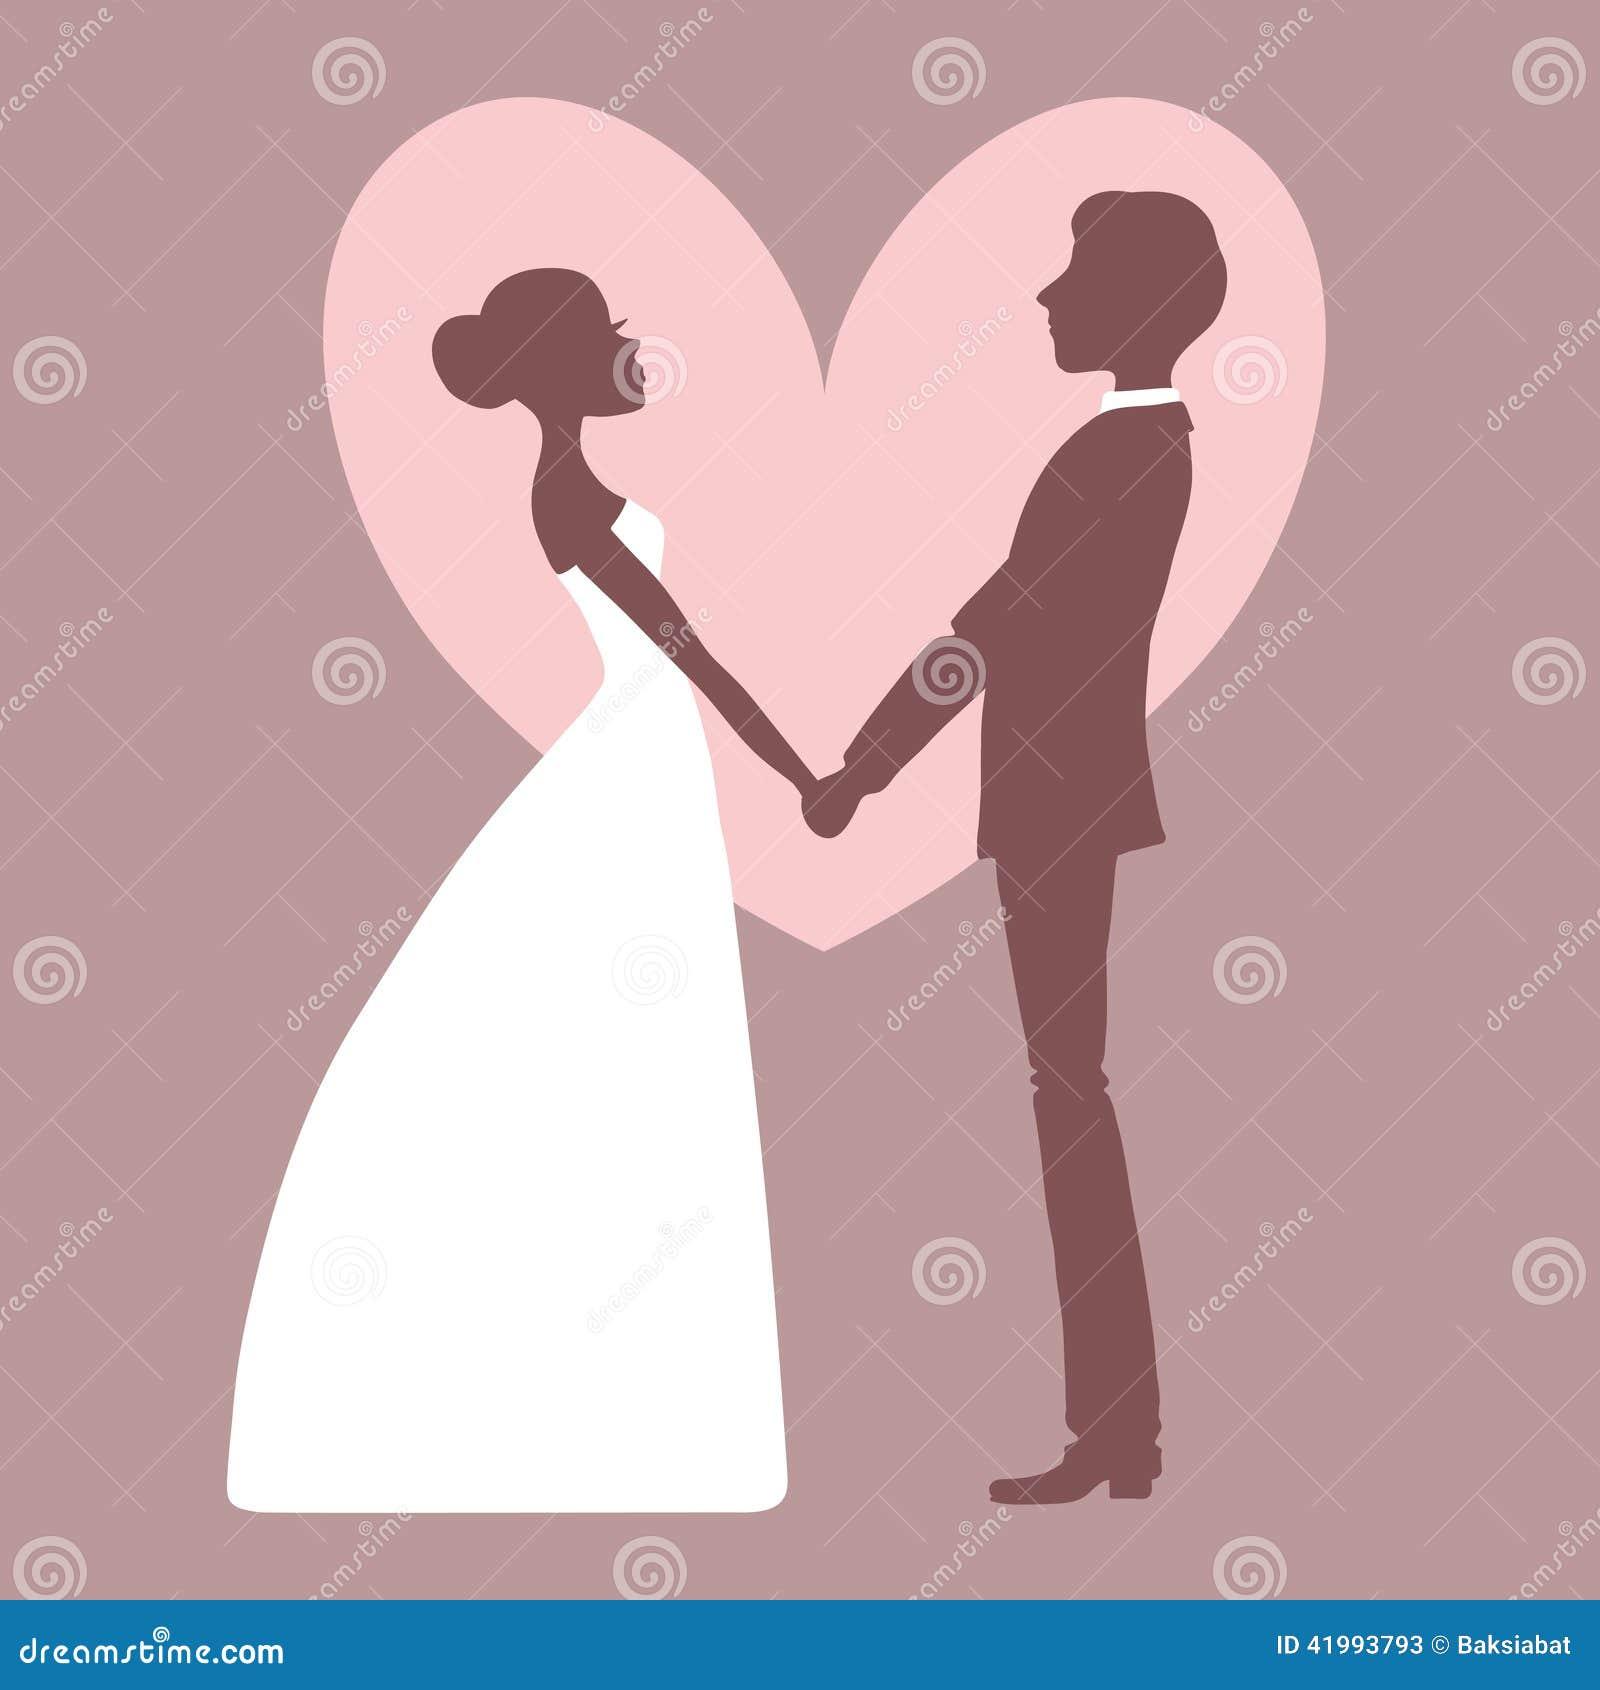 Wedding Invitation. Silhouette Of Bride And Groom Stock Vector ...